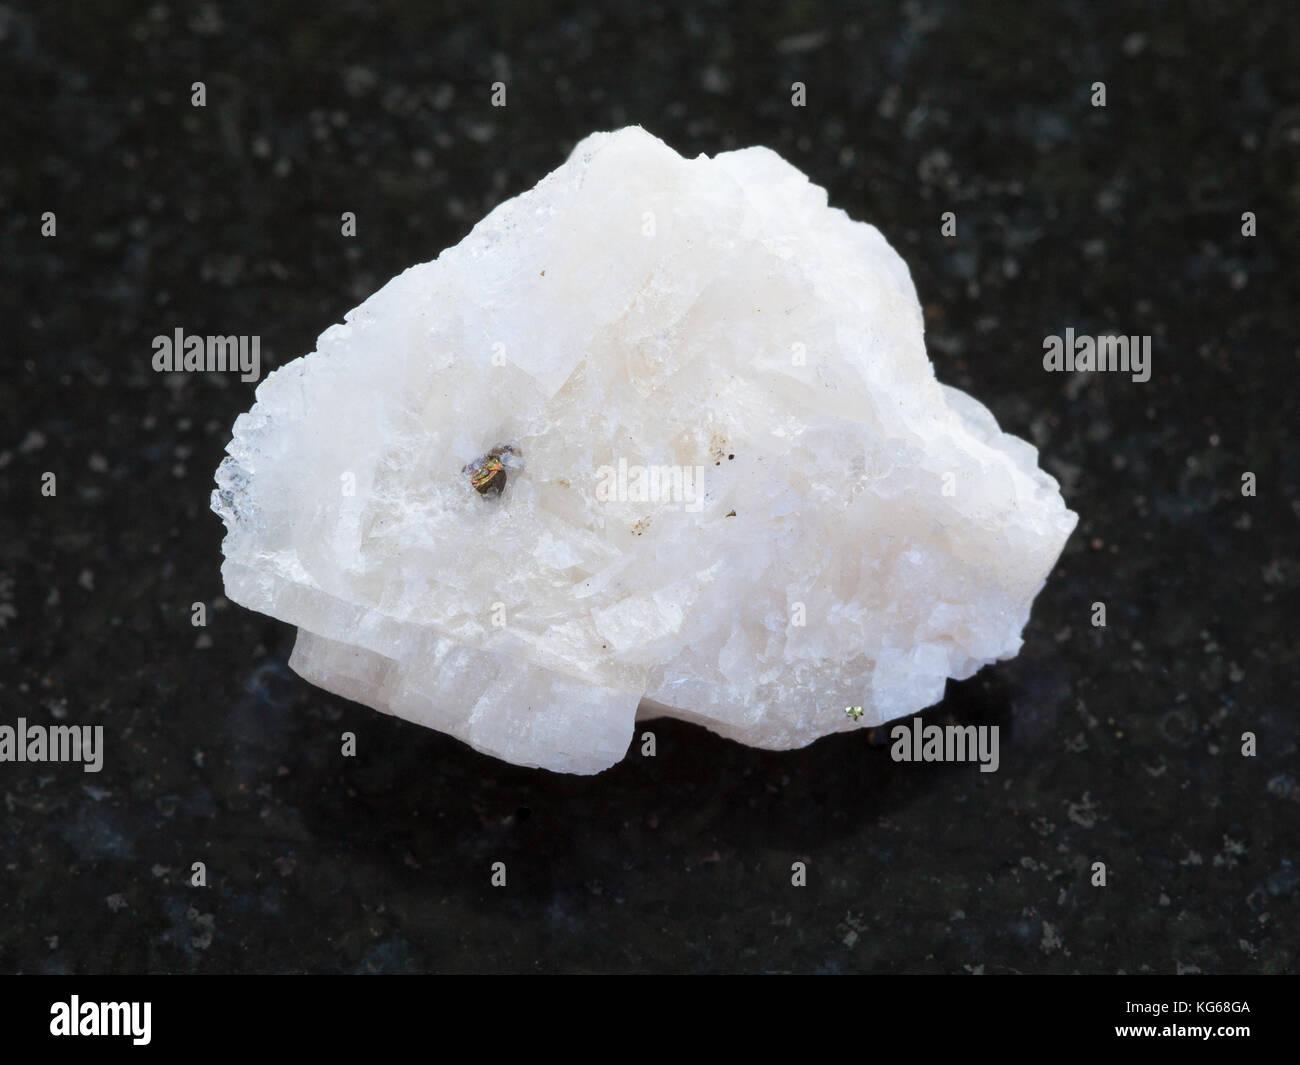 macro shooting of natural mineral rock specimen - rough Baryte stone on dark granite background - Stock Image